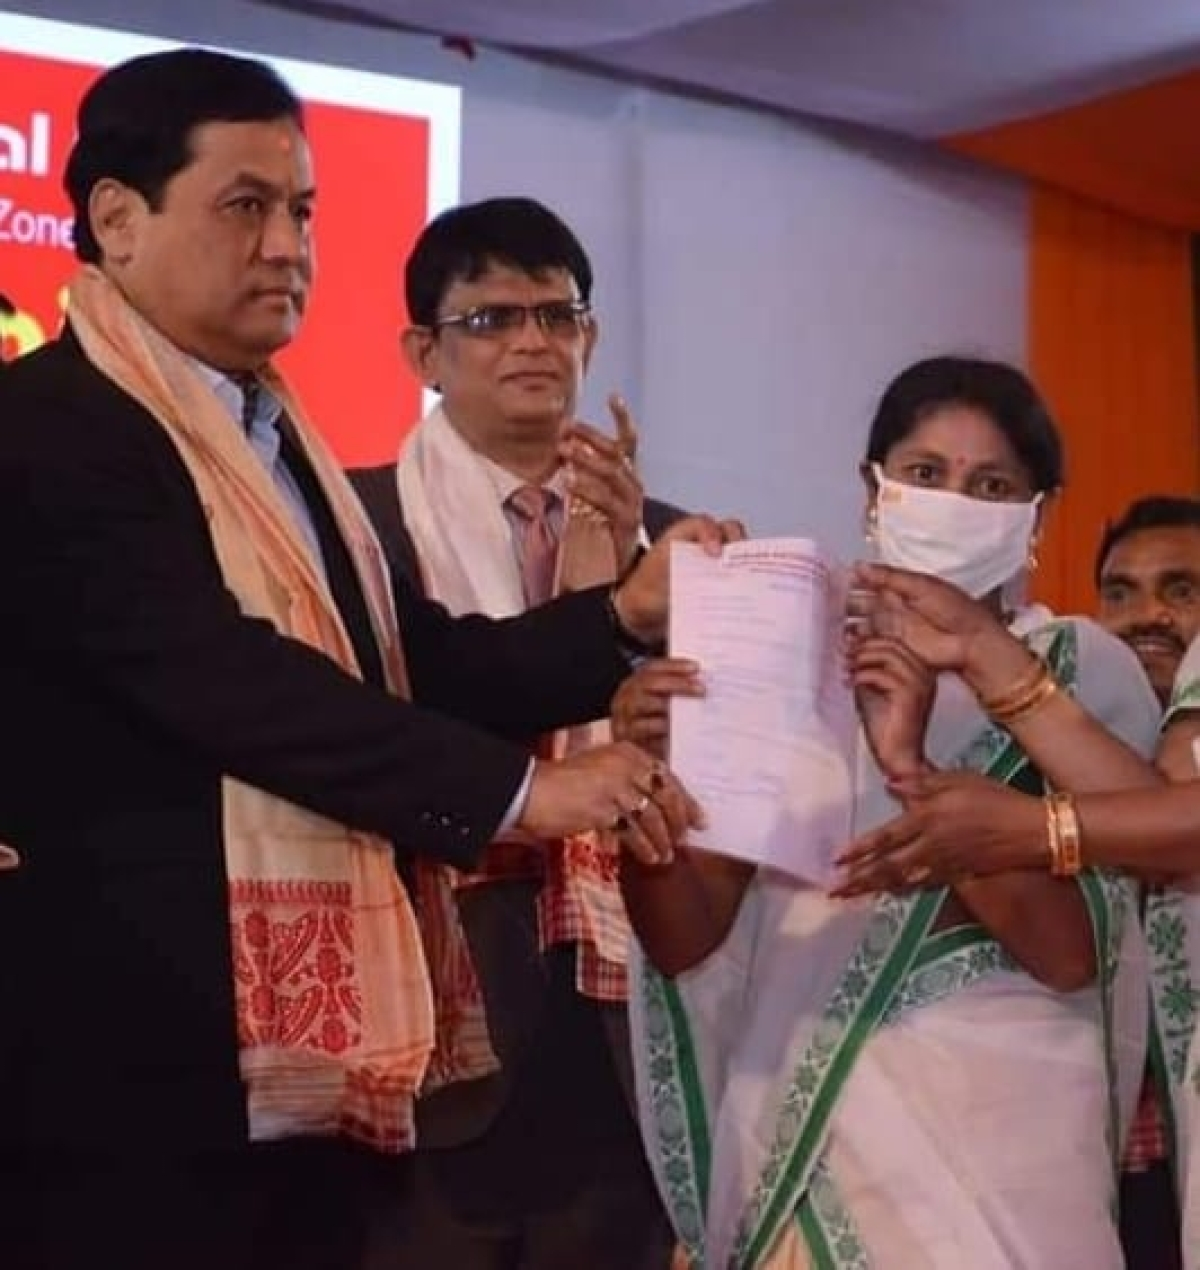 Assam CM Sarbananda Sonowal inaugurates PNB's Phuloni Chariali Branch in Majuli in presence of MD & CEO CH S S Mallikarjuna Rao